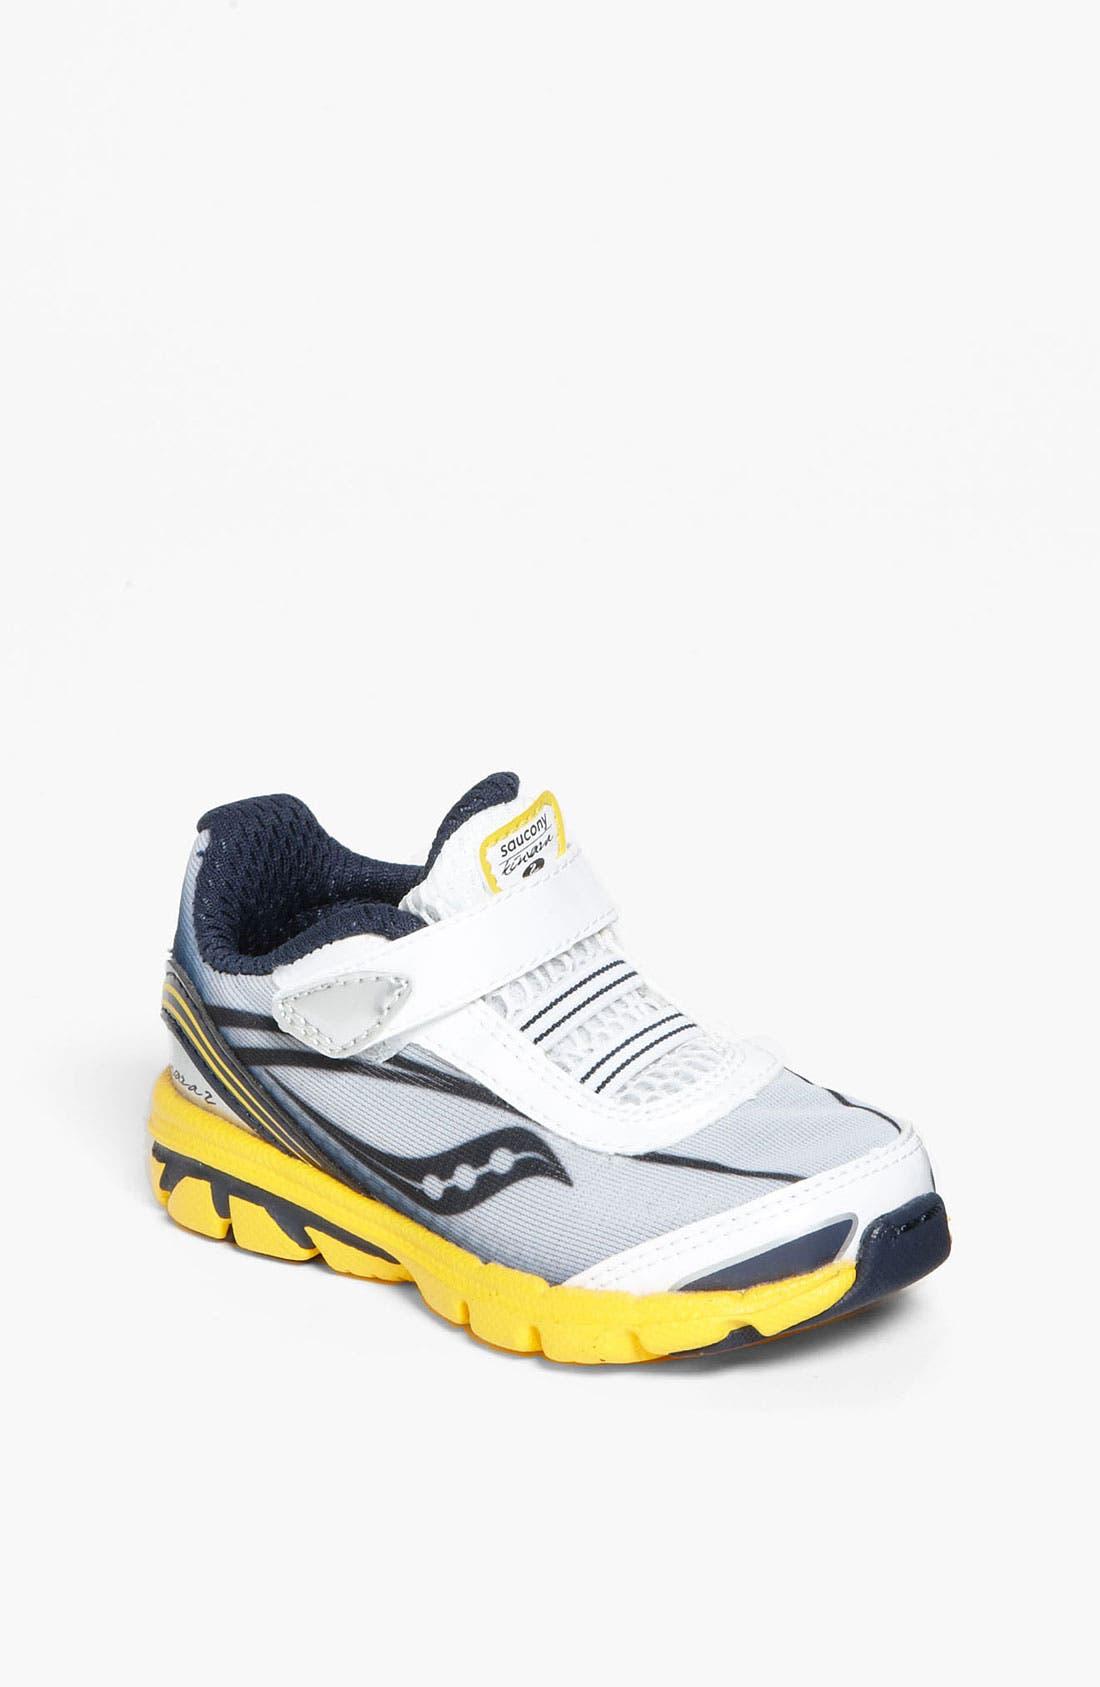 Main Image - Saucony 'Kinvara' Athletic Shoe (Baby, Walker & Toddler)